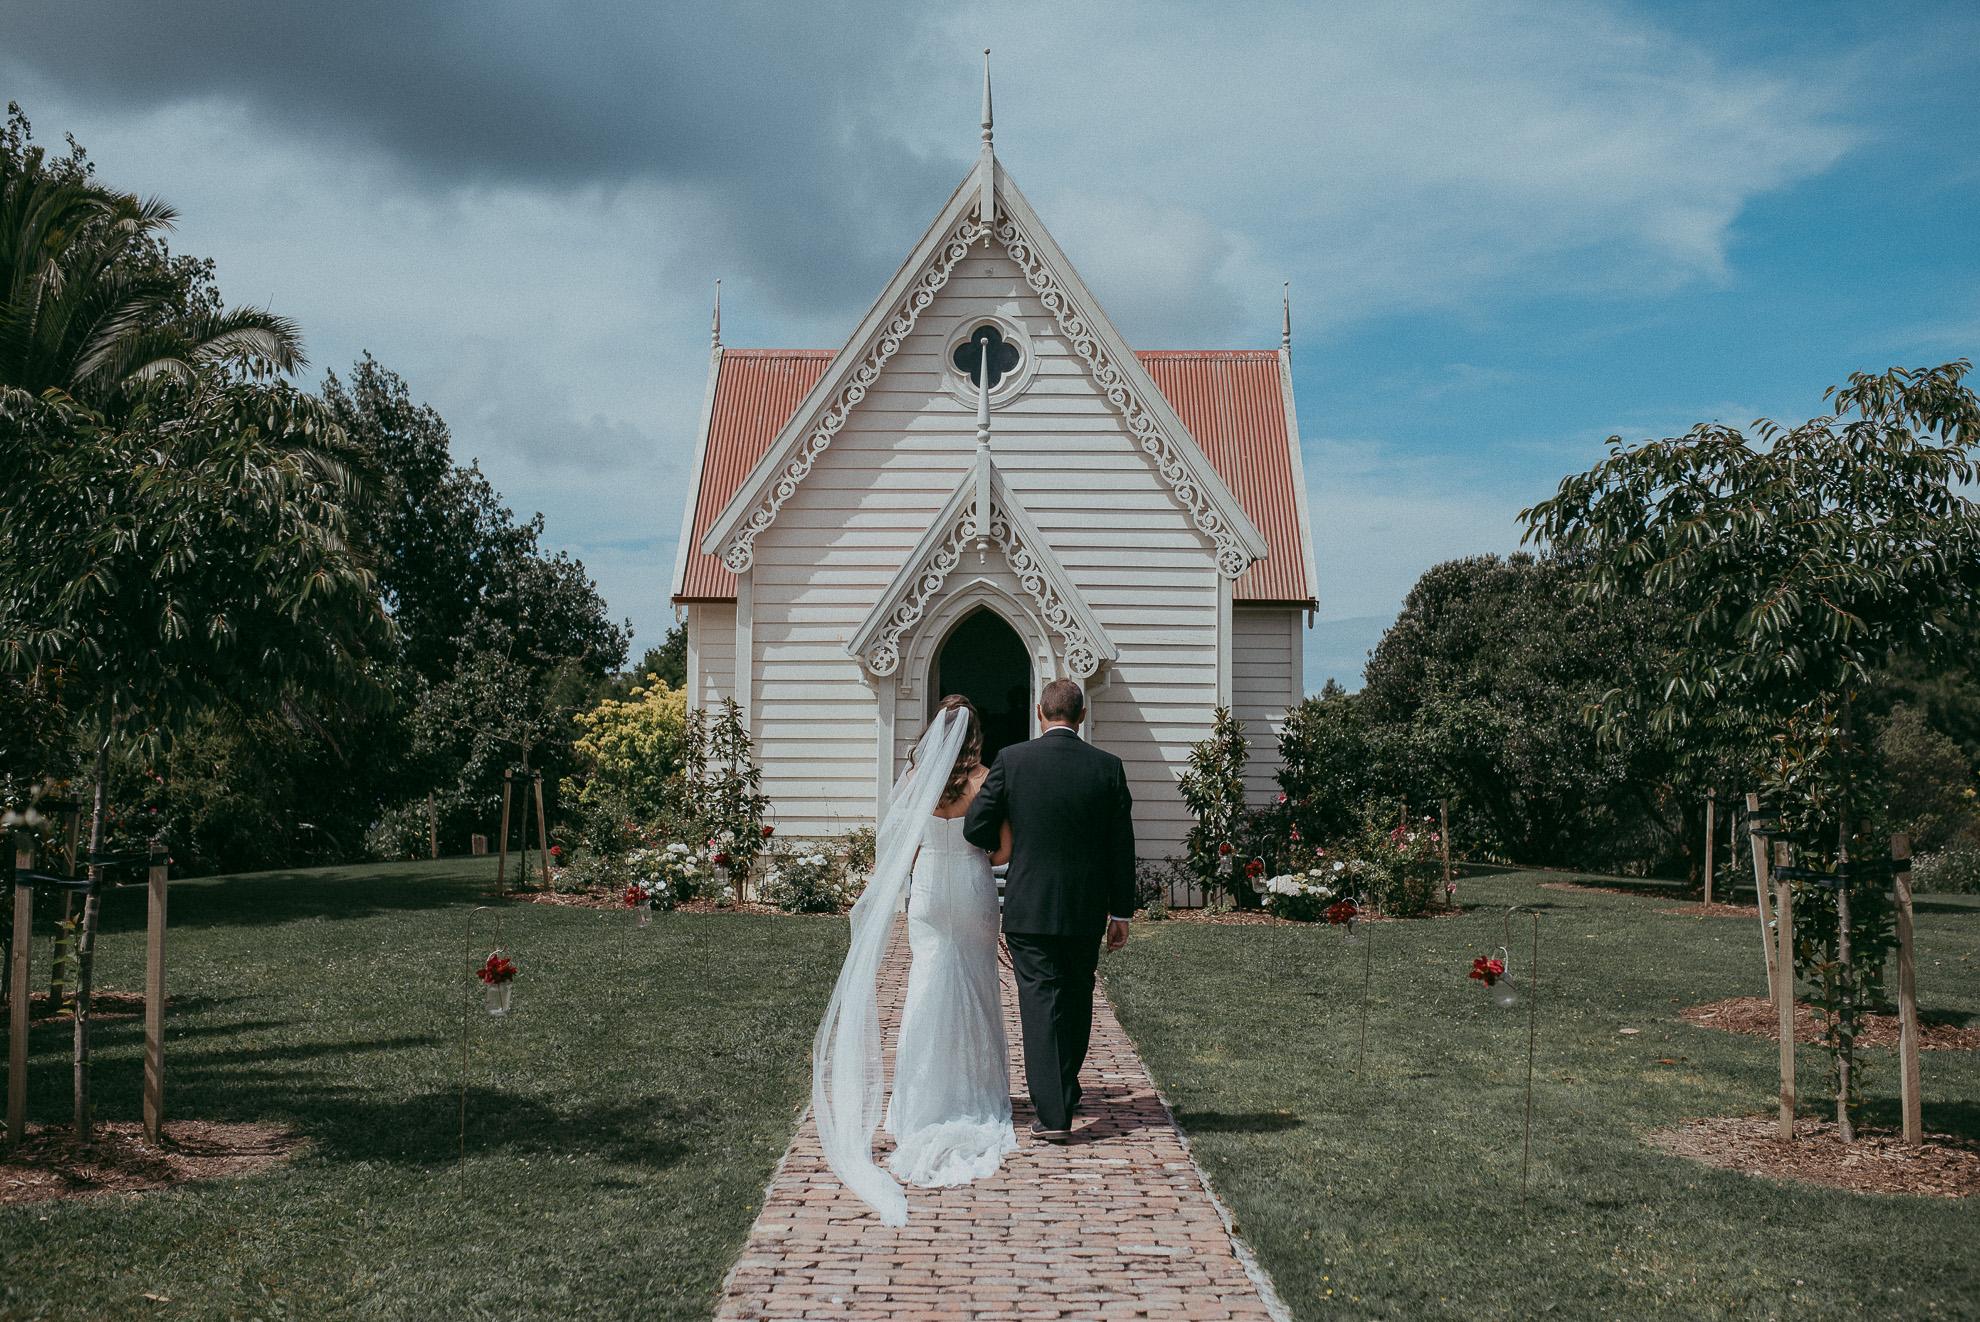 wedding-by-levien-254.JPG